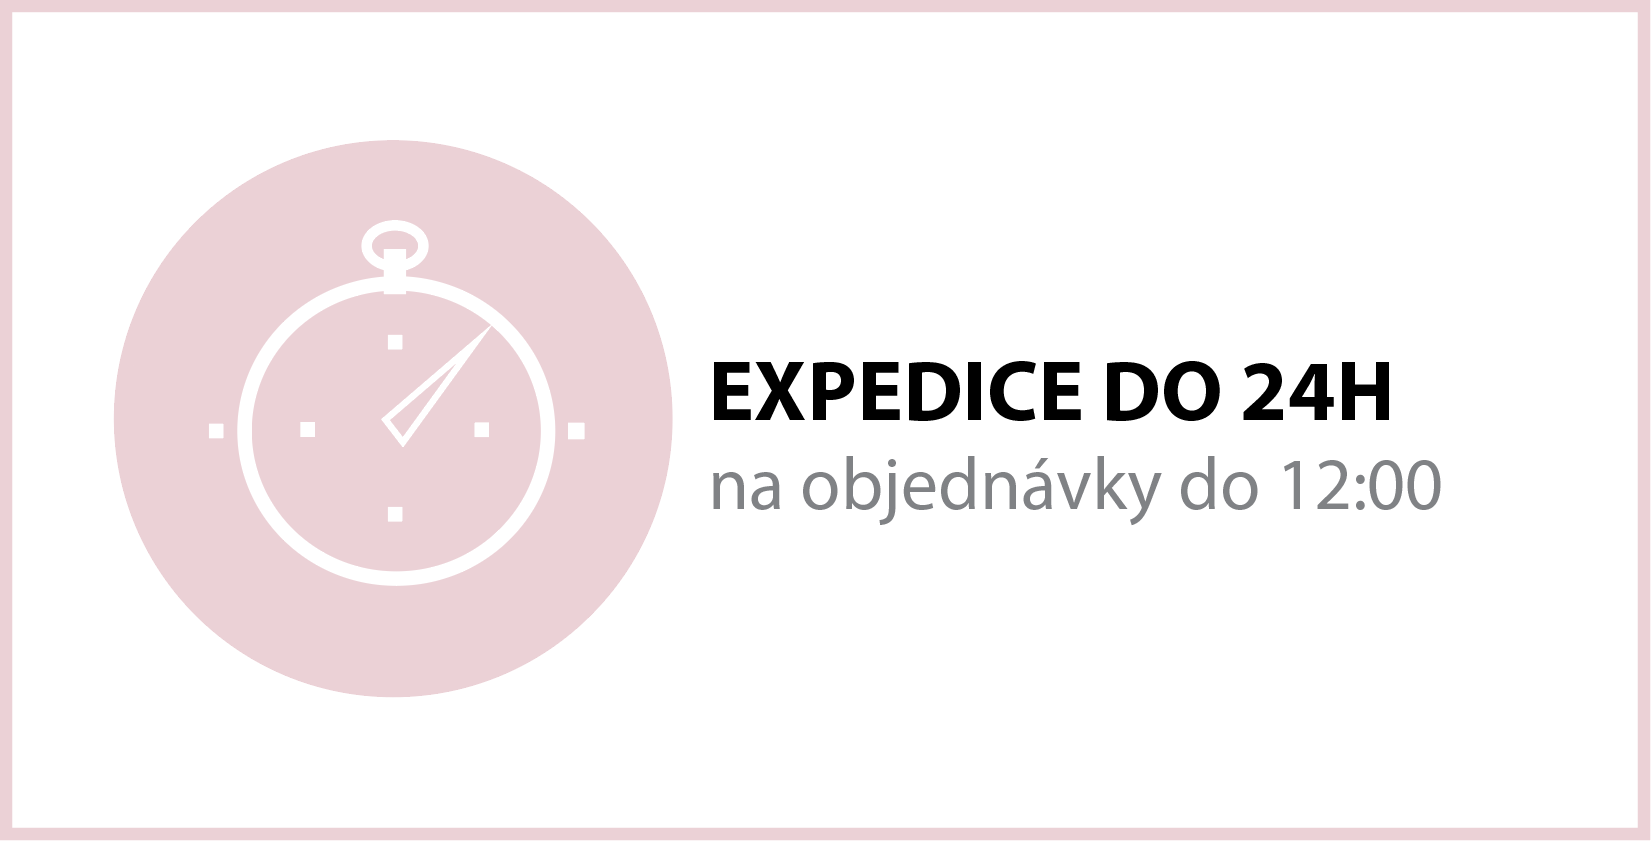 Expedice do 24H